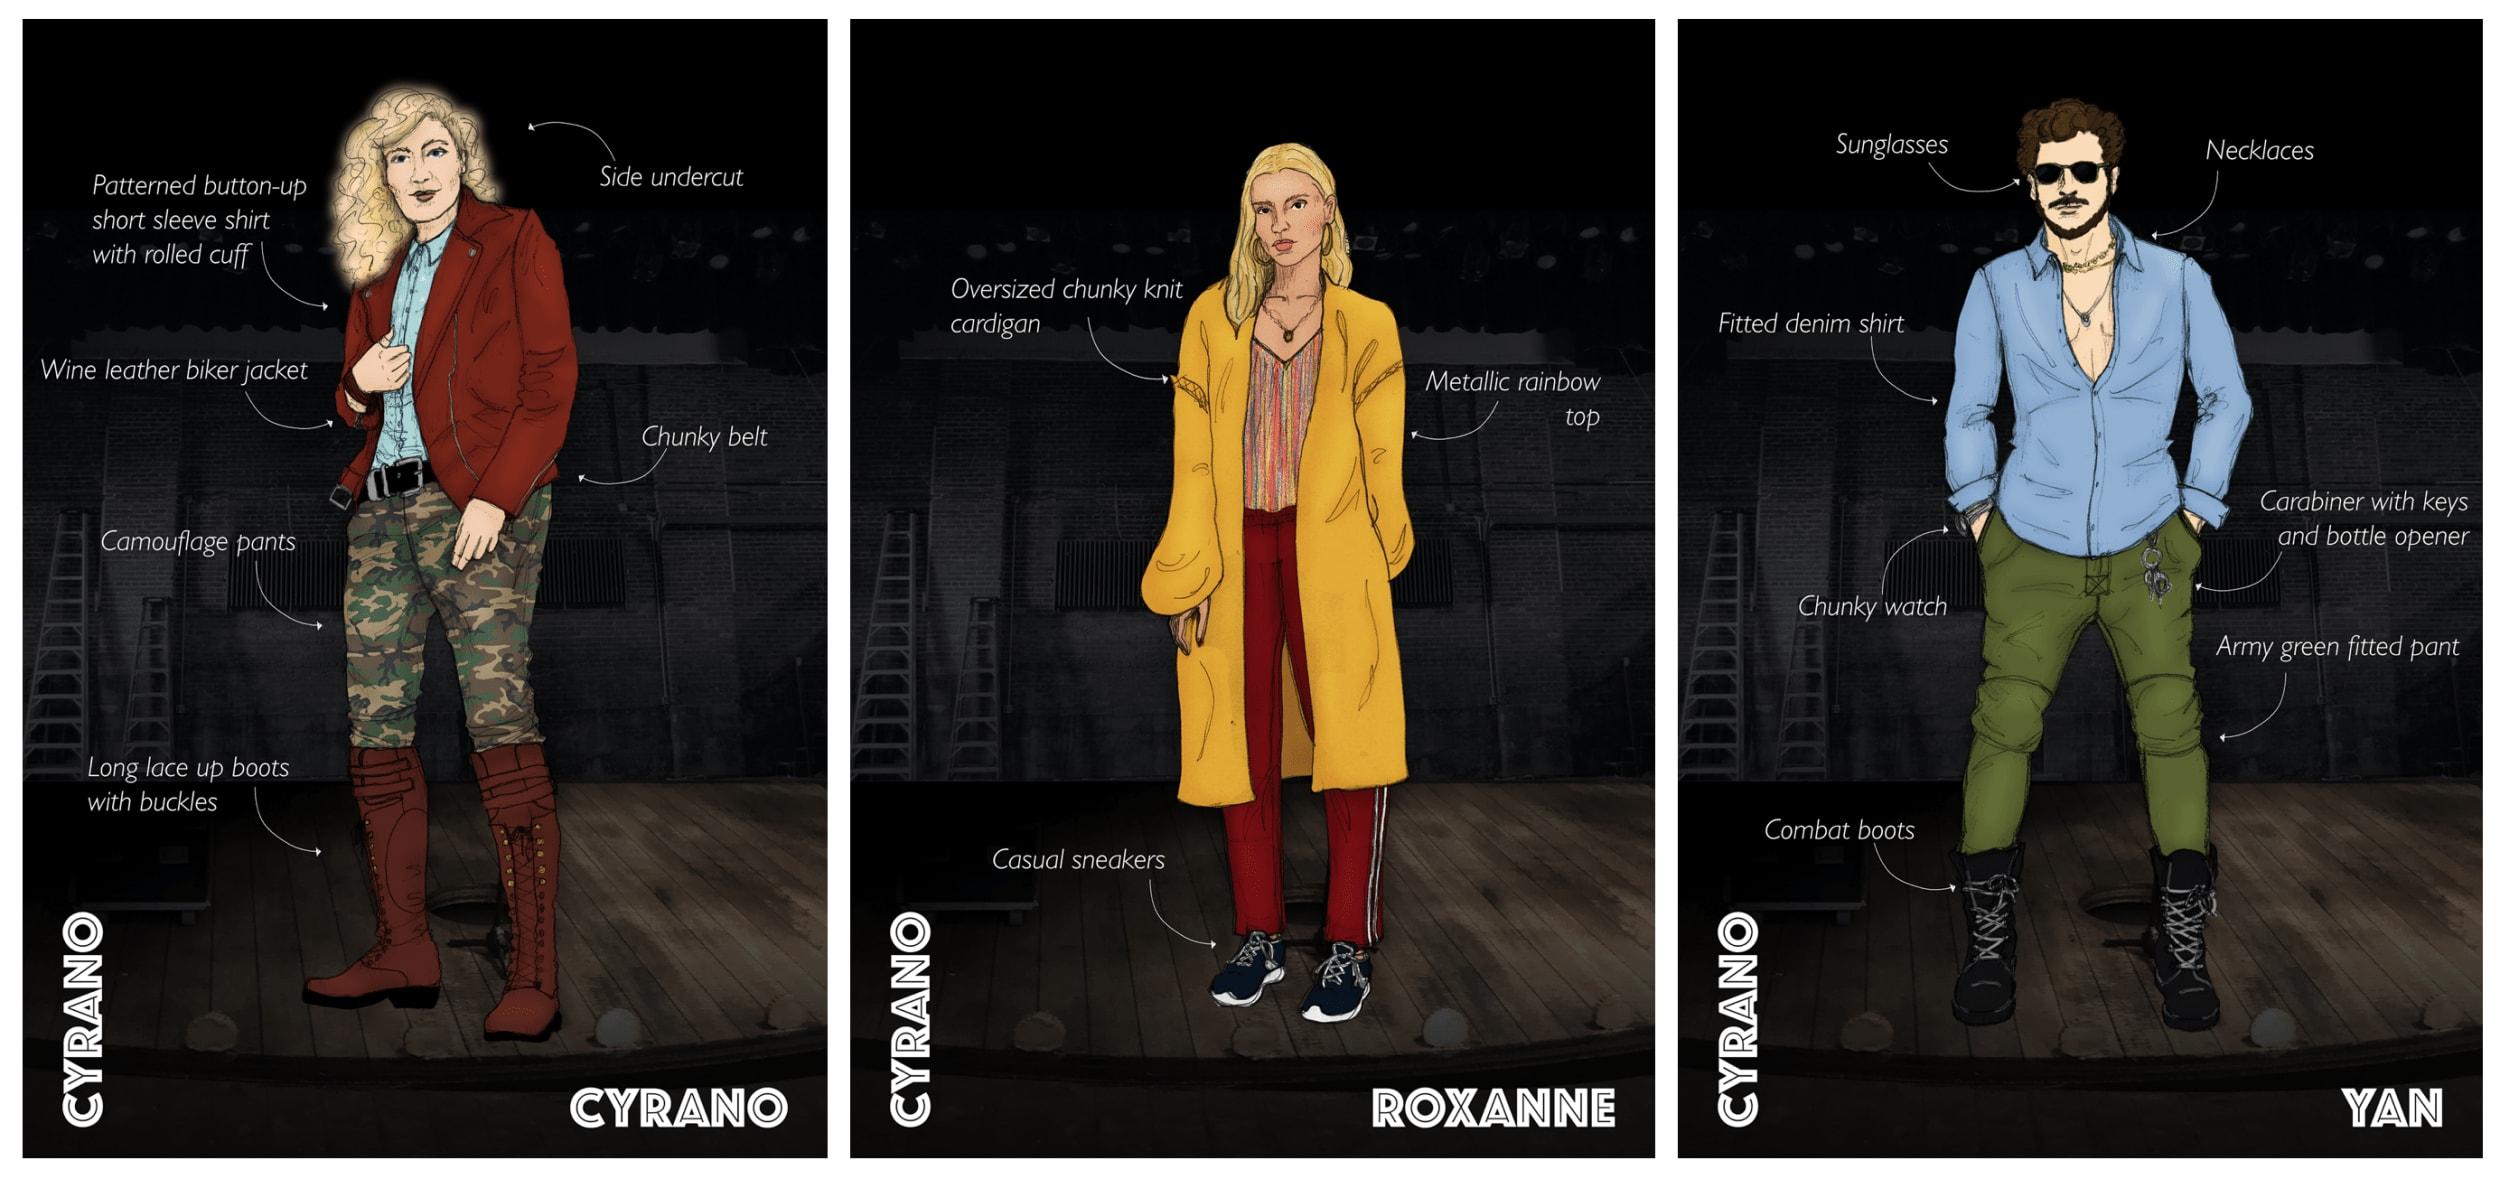 Cyrano_Roxanne_Yan_Costumes_by_Jo_Briscoe.png